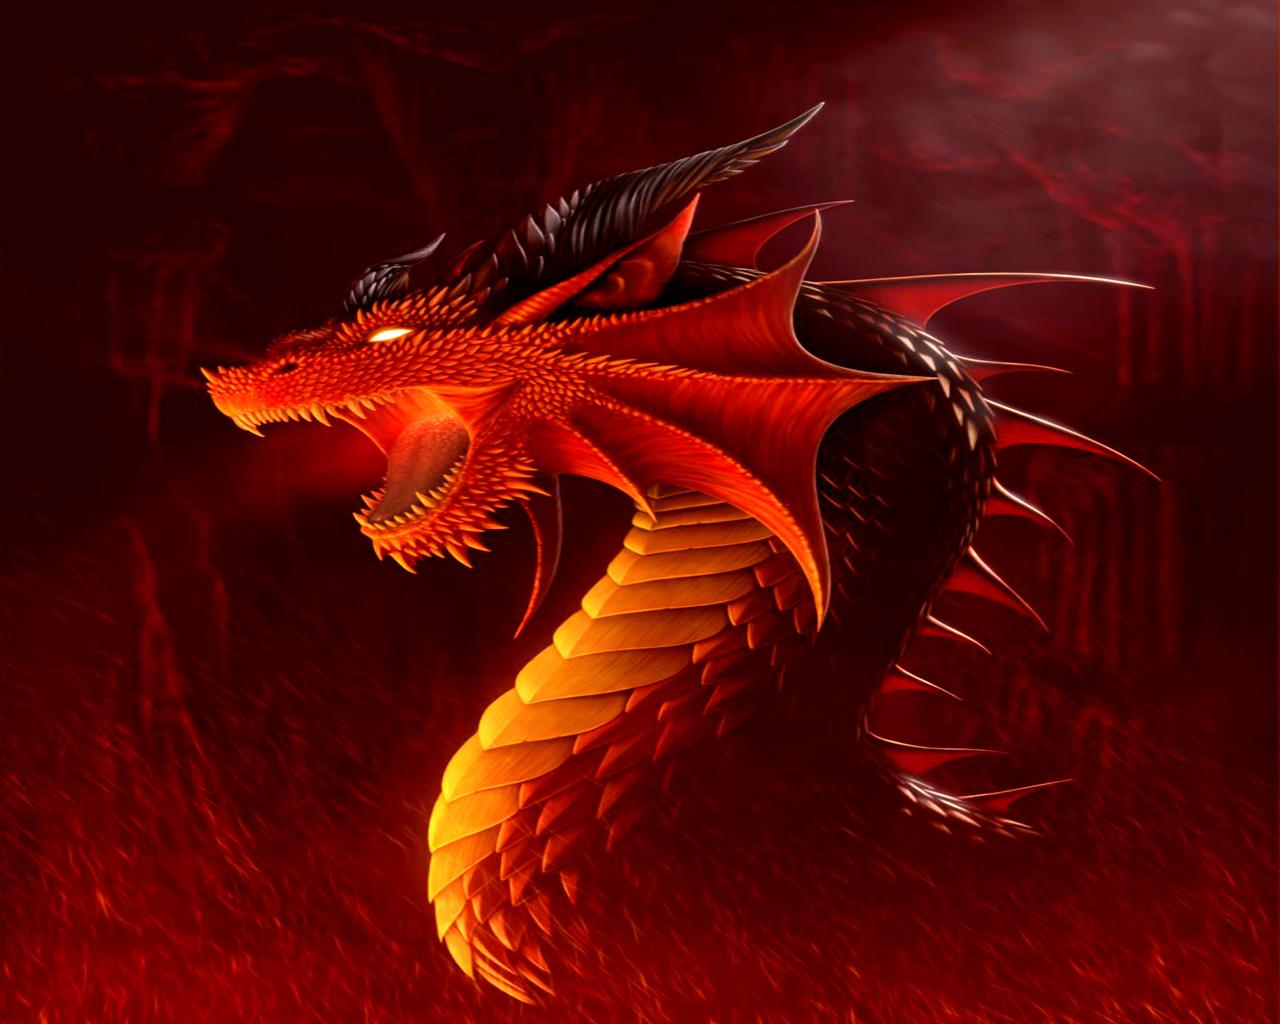 Image anime devil girl the legend of red dragon picture design anime devil girl the legend of red dragon picture design high 752649g voltagebd Choice Image